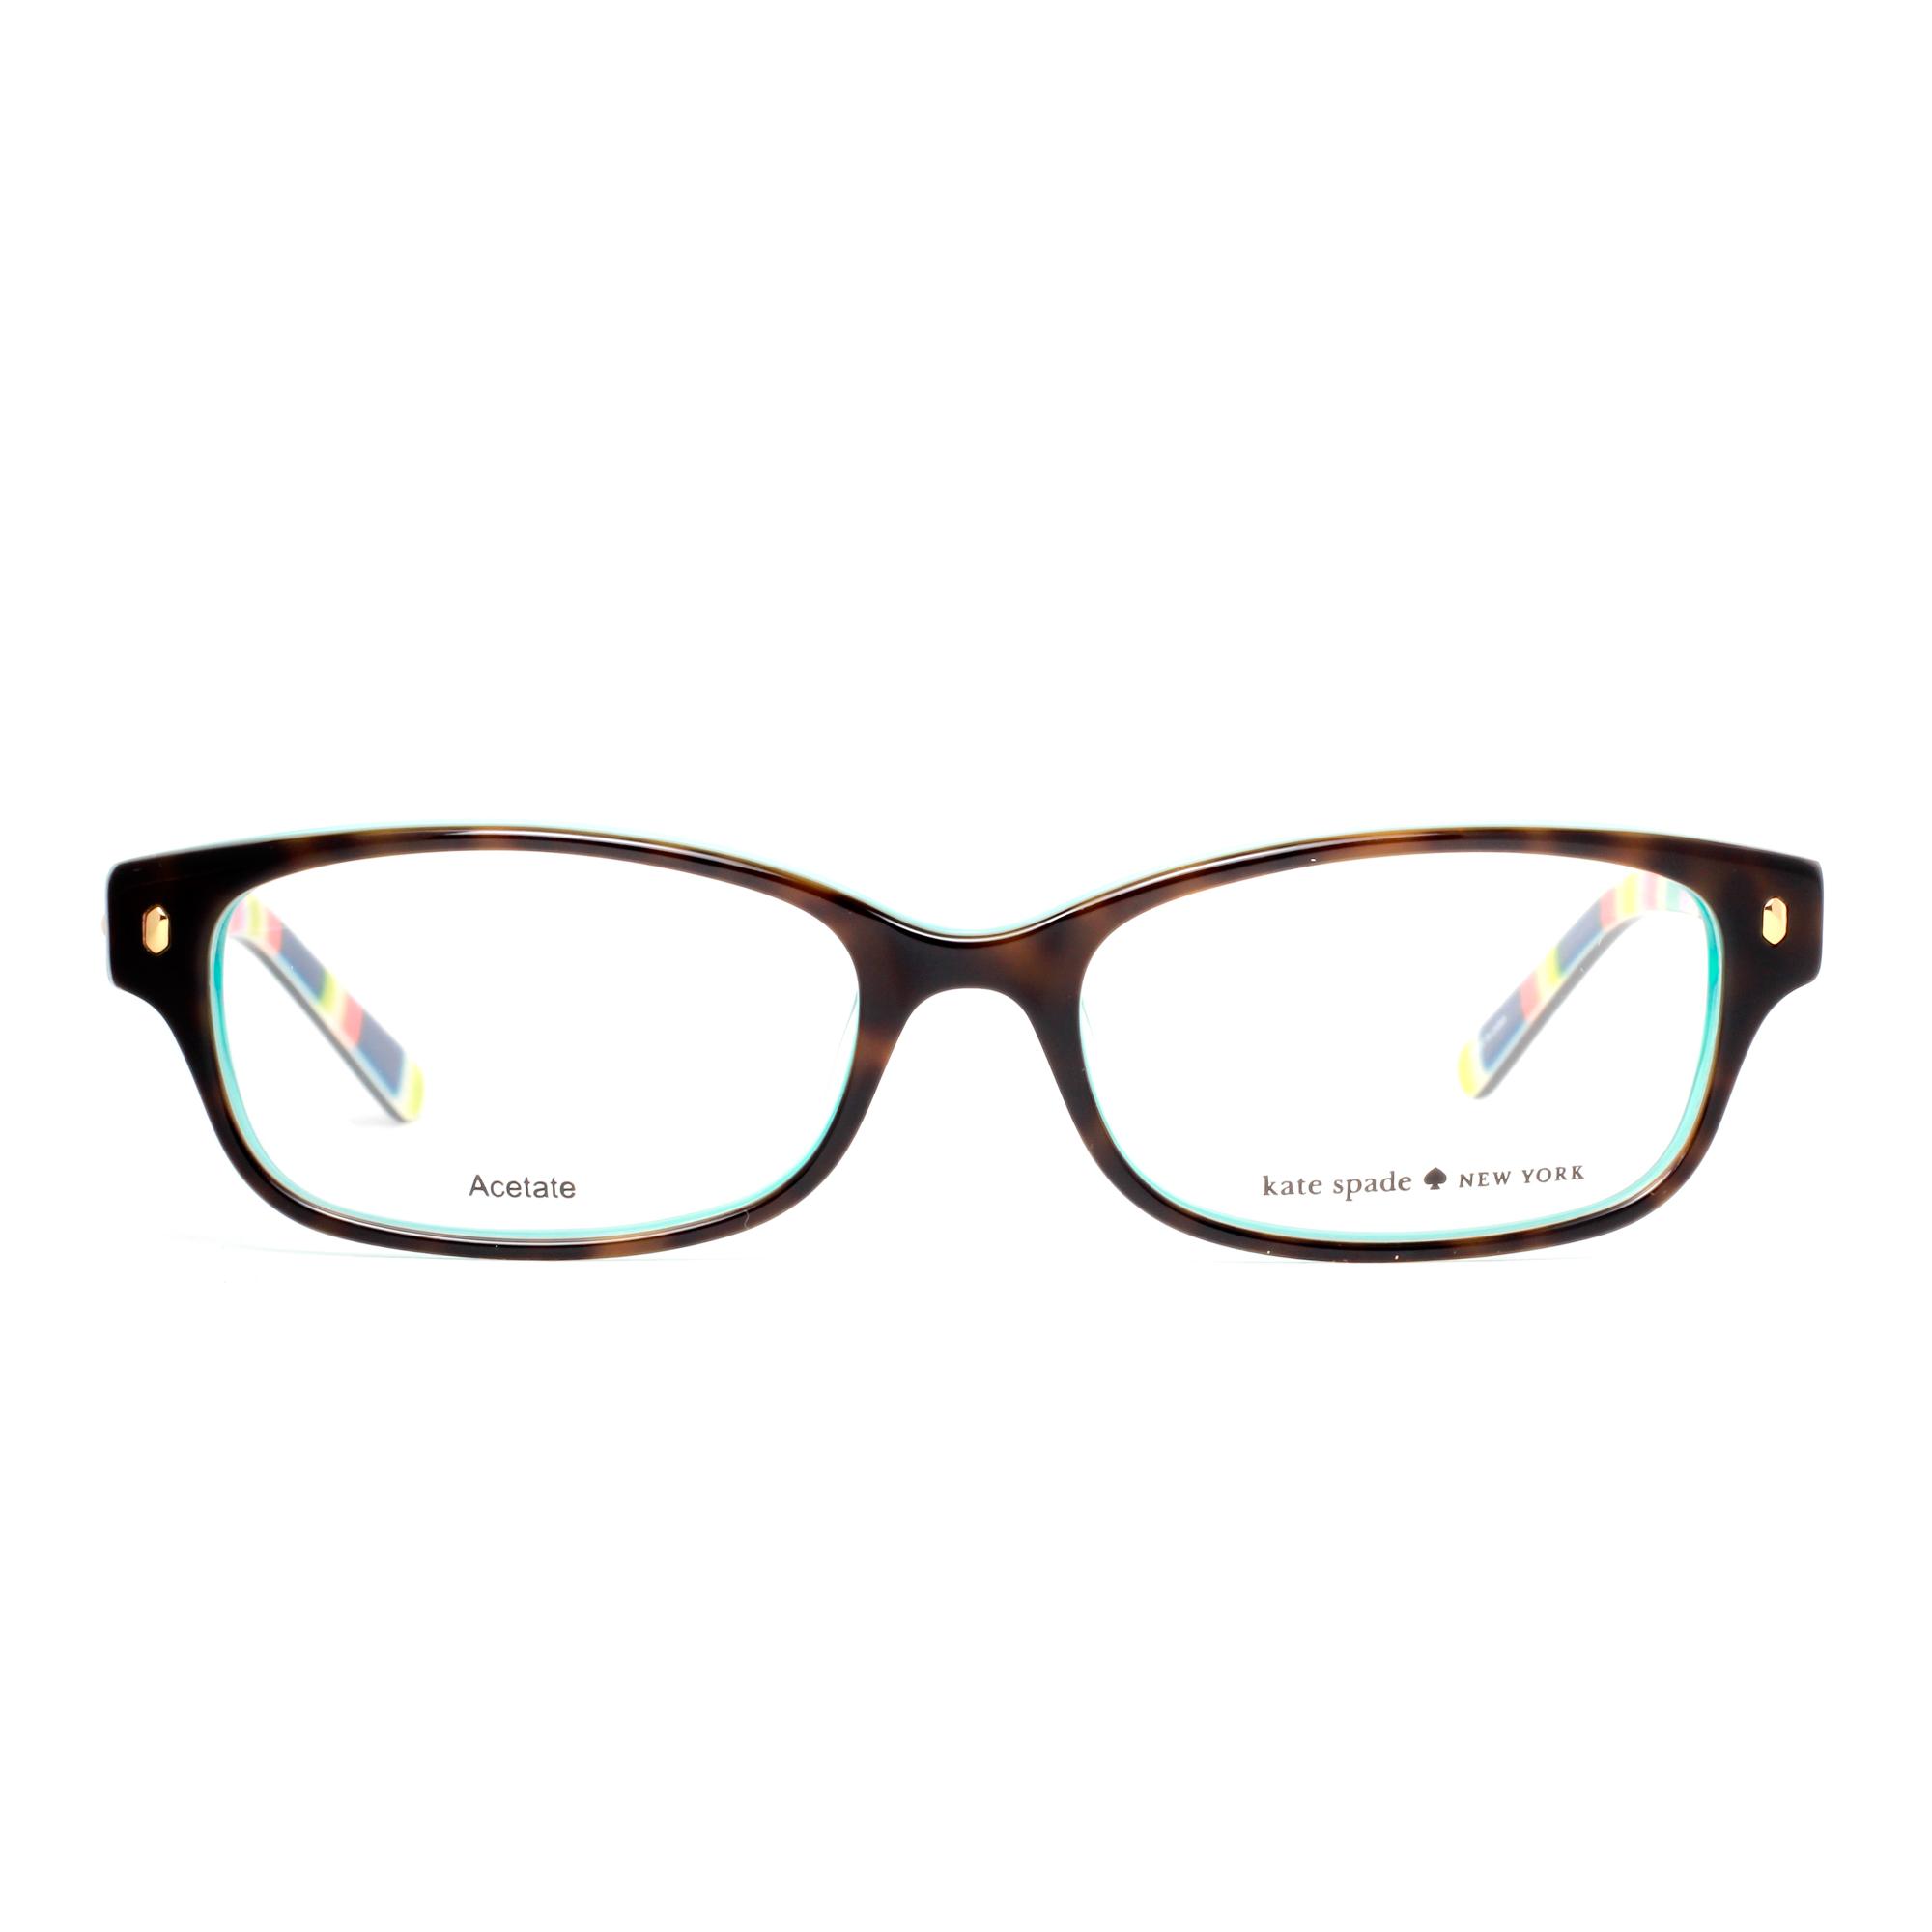 Kate Spade Tortoise Shell Eyeglass Frames : Kate Spade Lucyann X77 Brown Tortoise/Aqua Stripes Womens ...